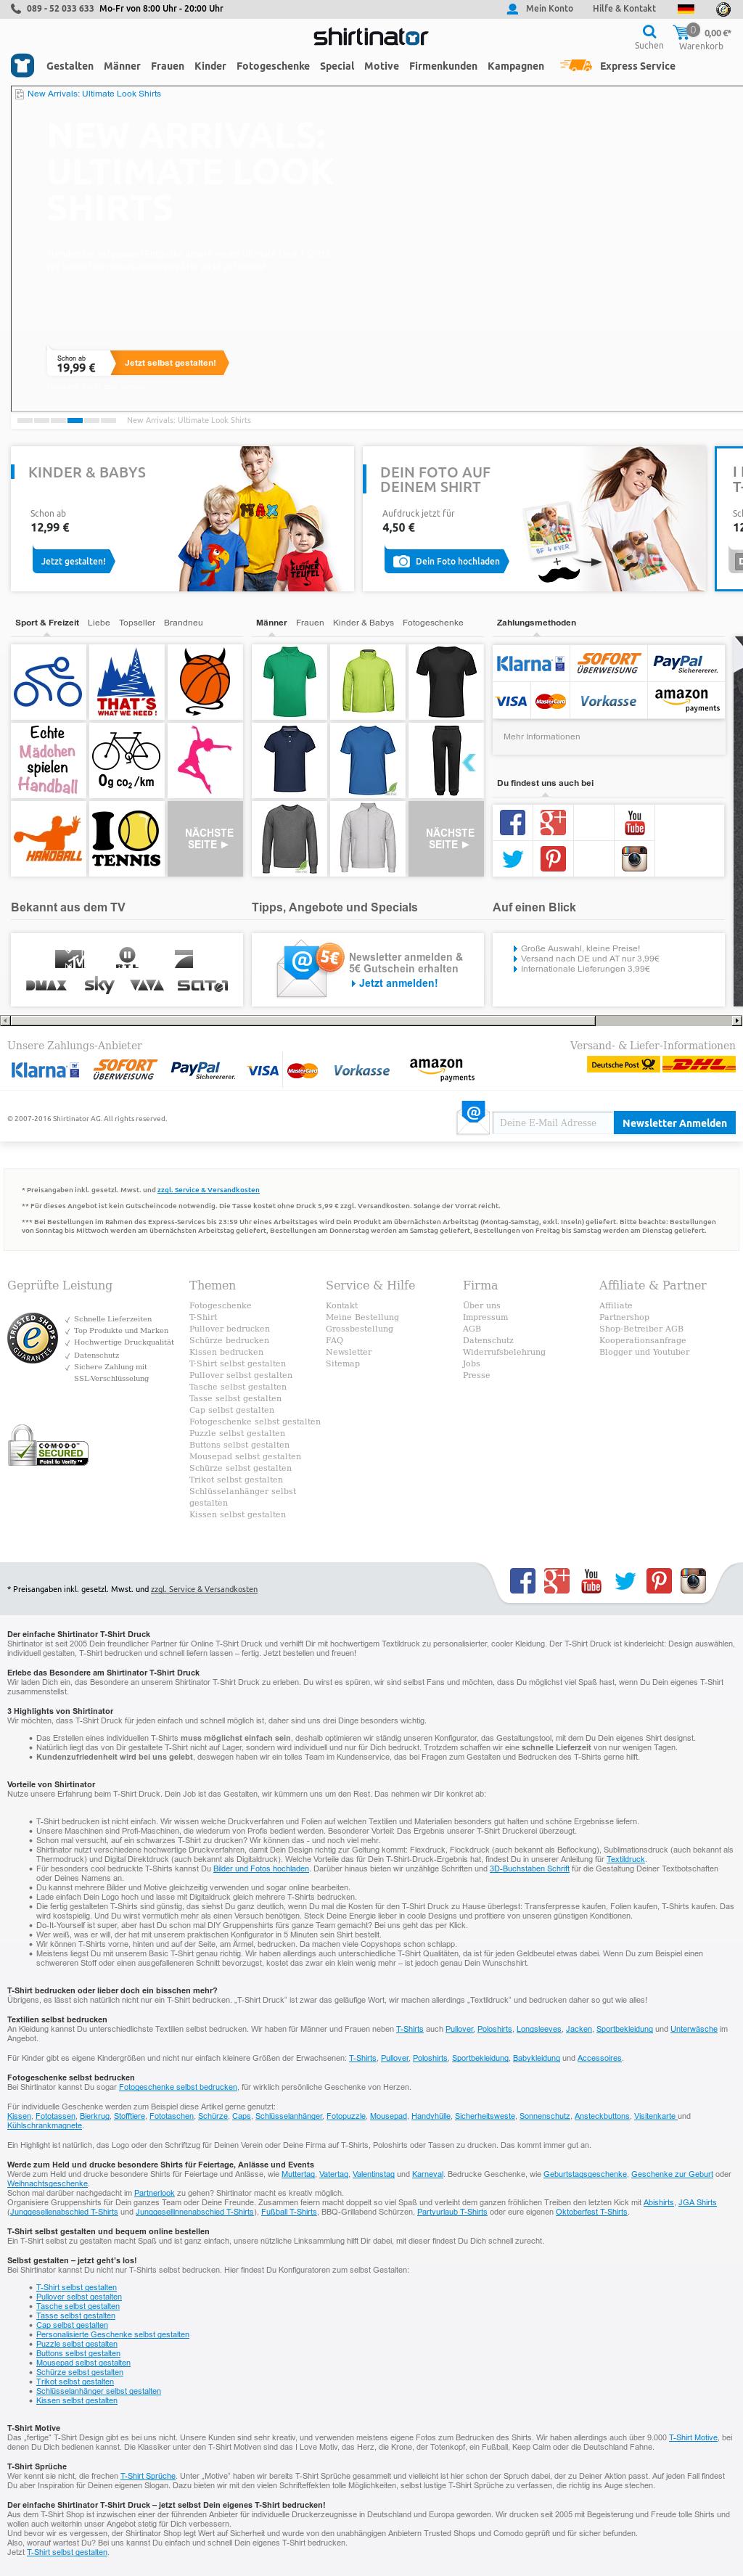 Shirtinator Deutschland Competitors, Revenue and Employees - Owler ...